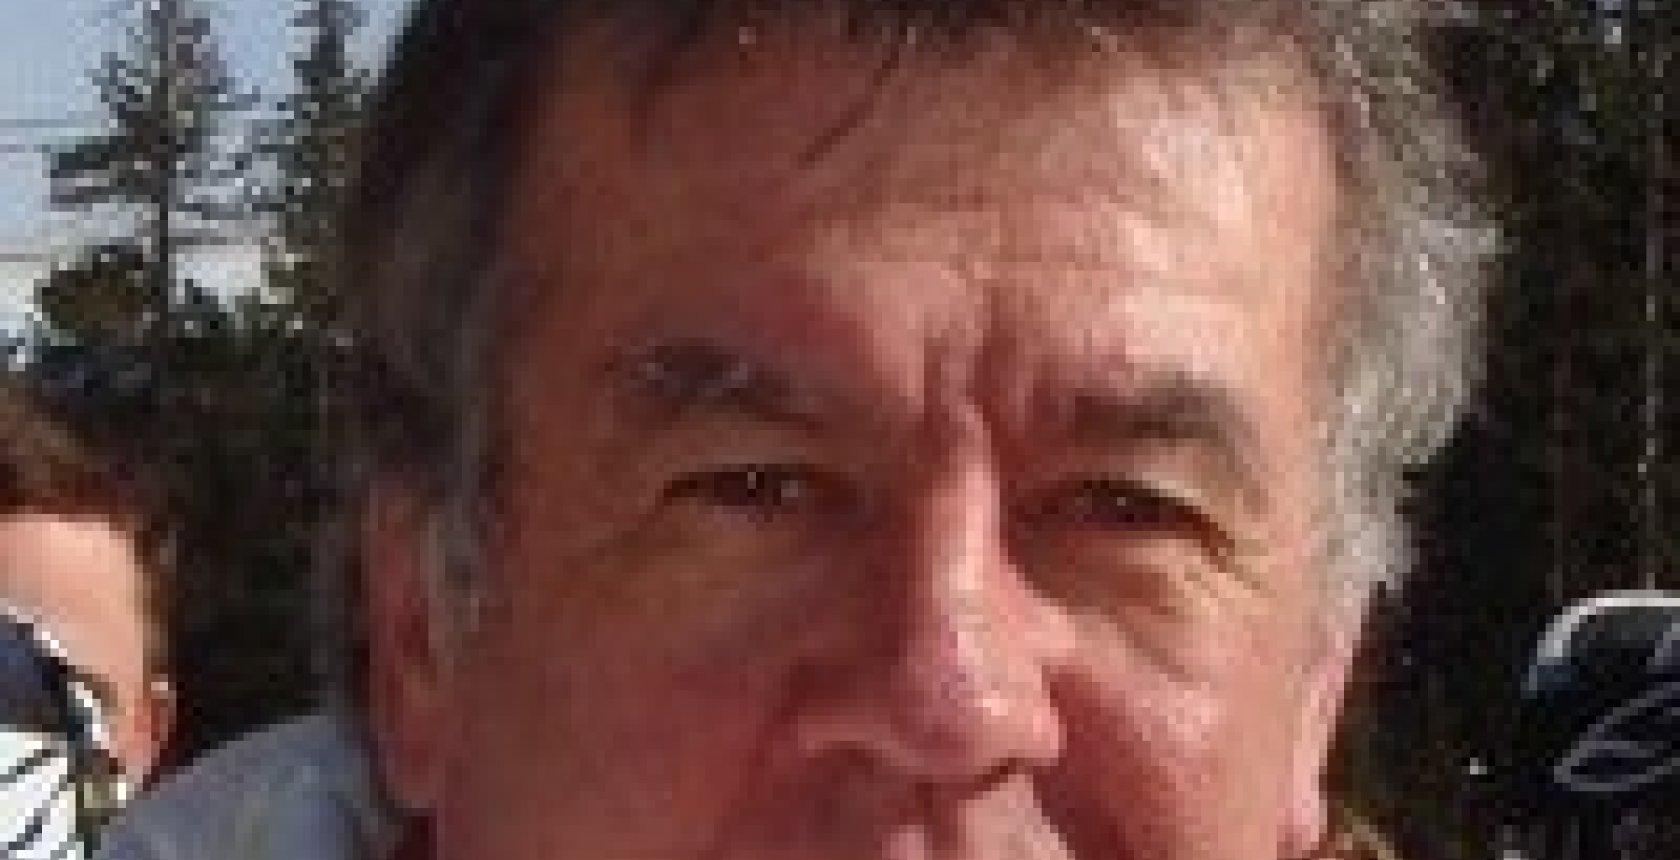 Paul Gilligan